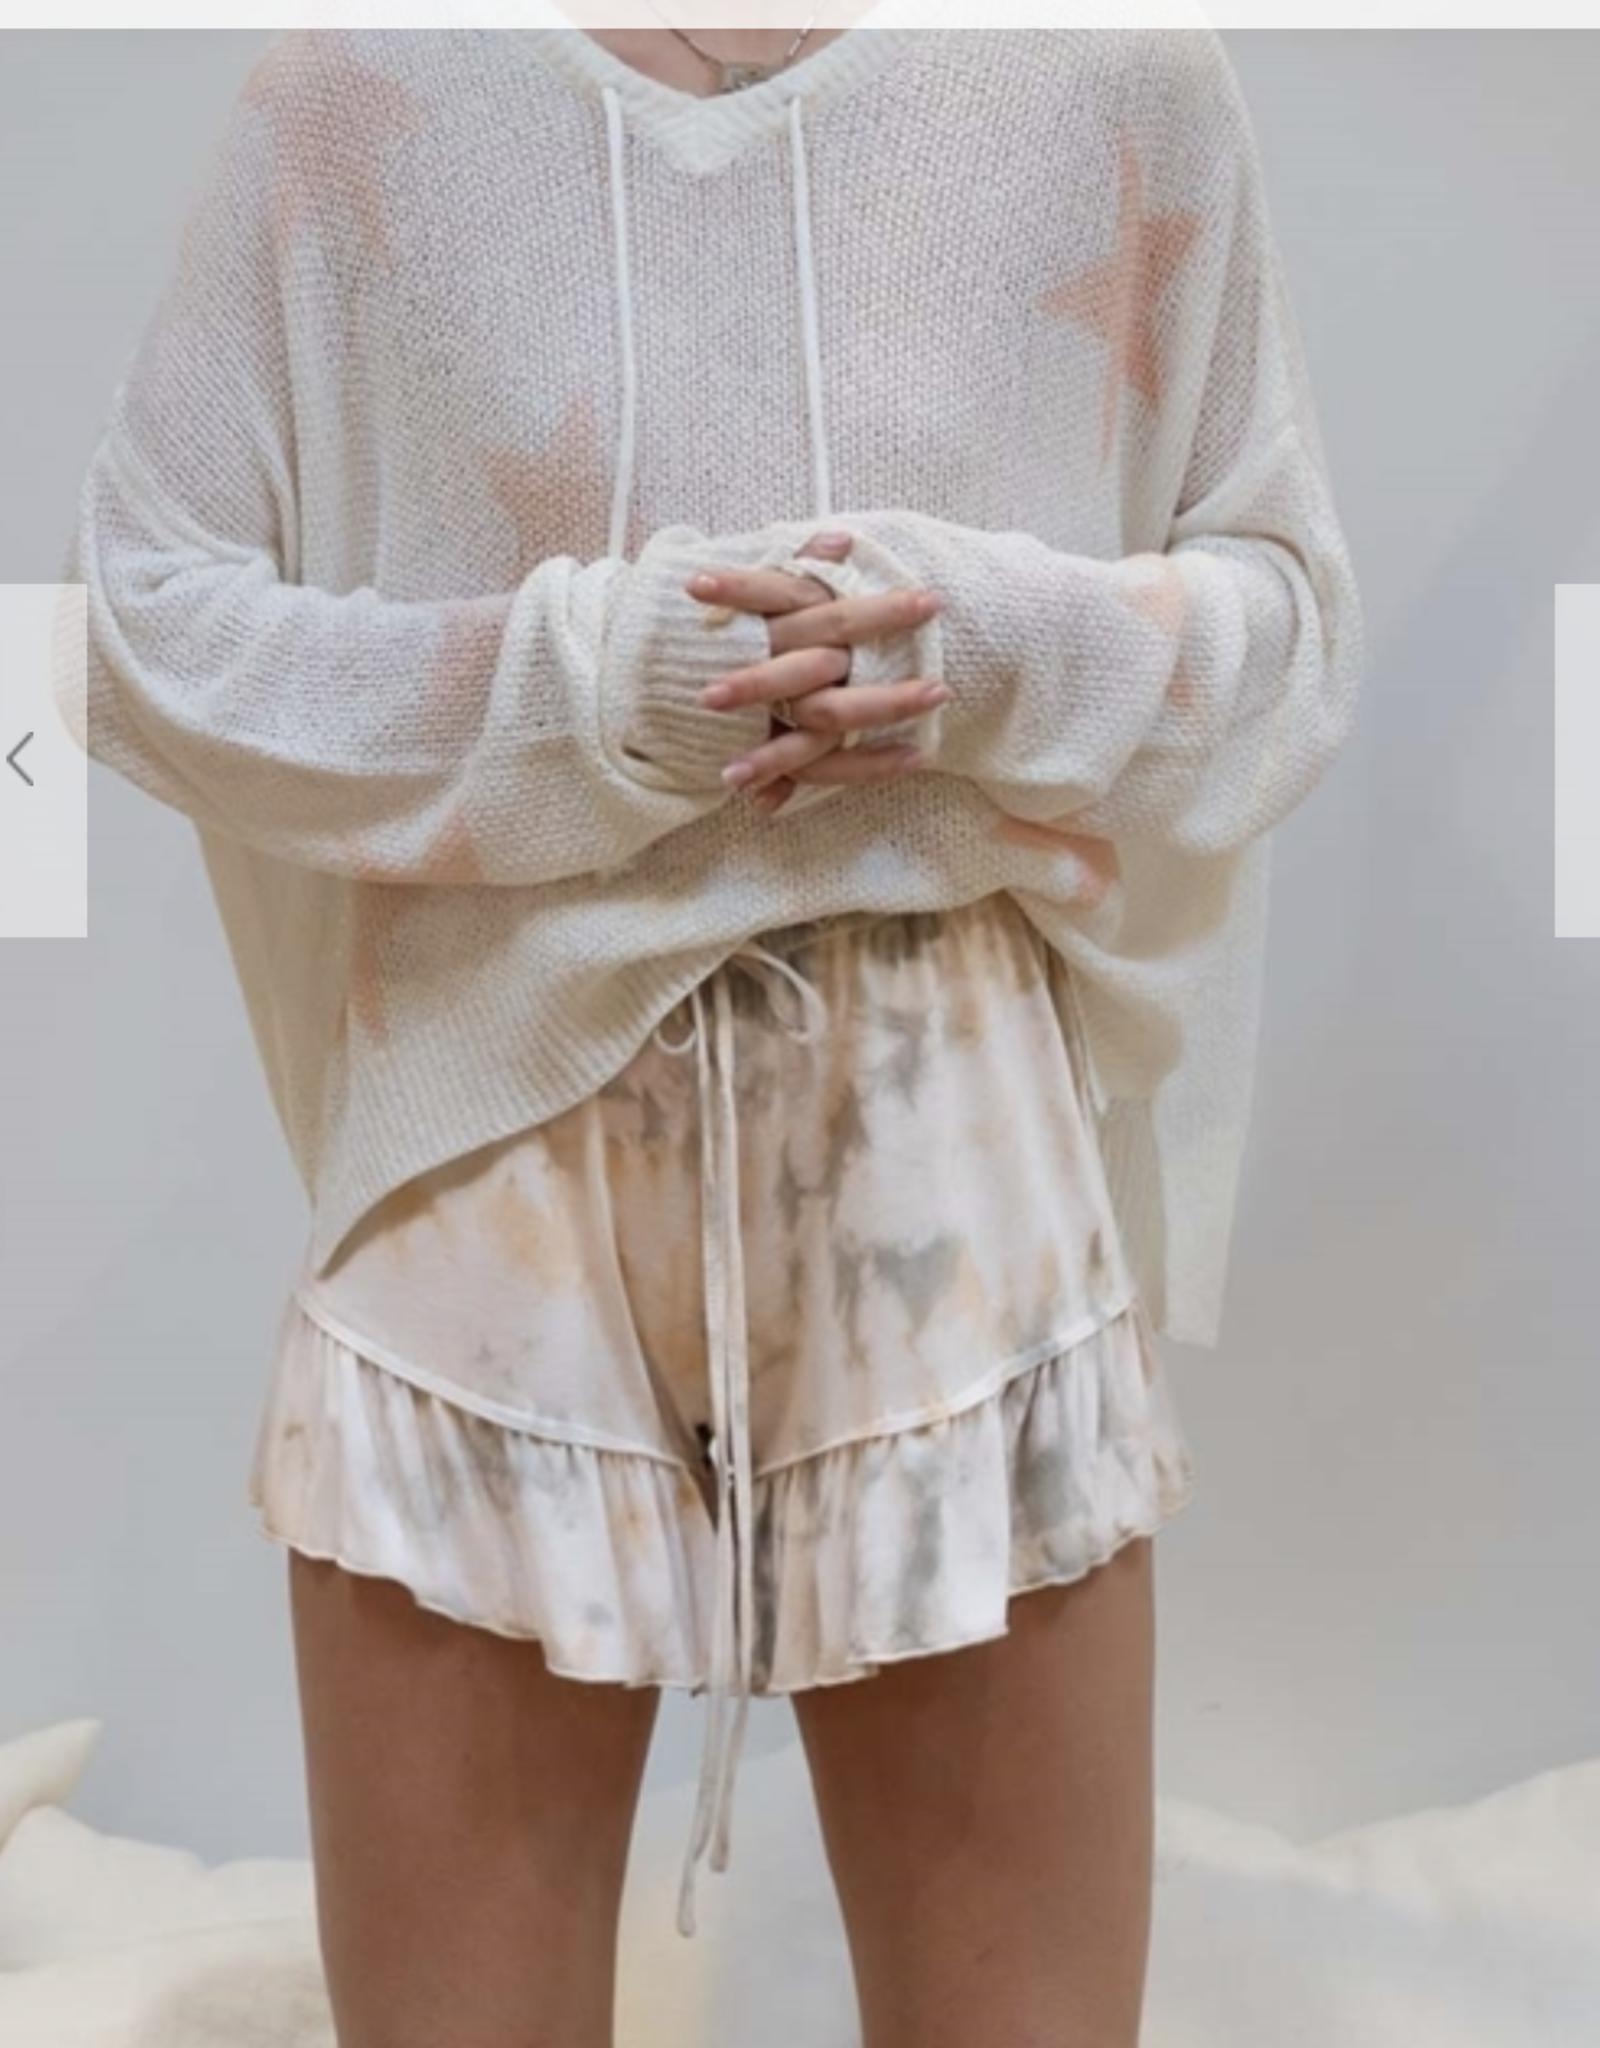 POL Clothing tie dye coconut blend knit shorts